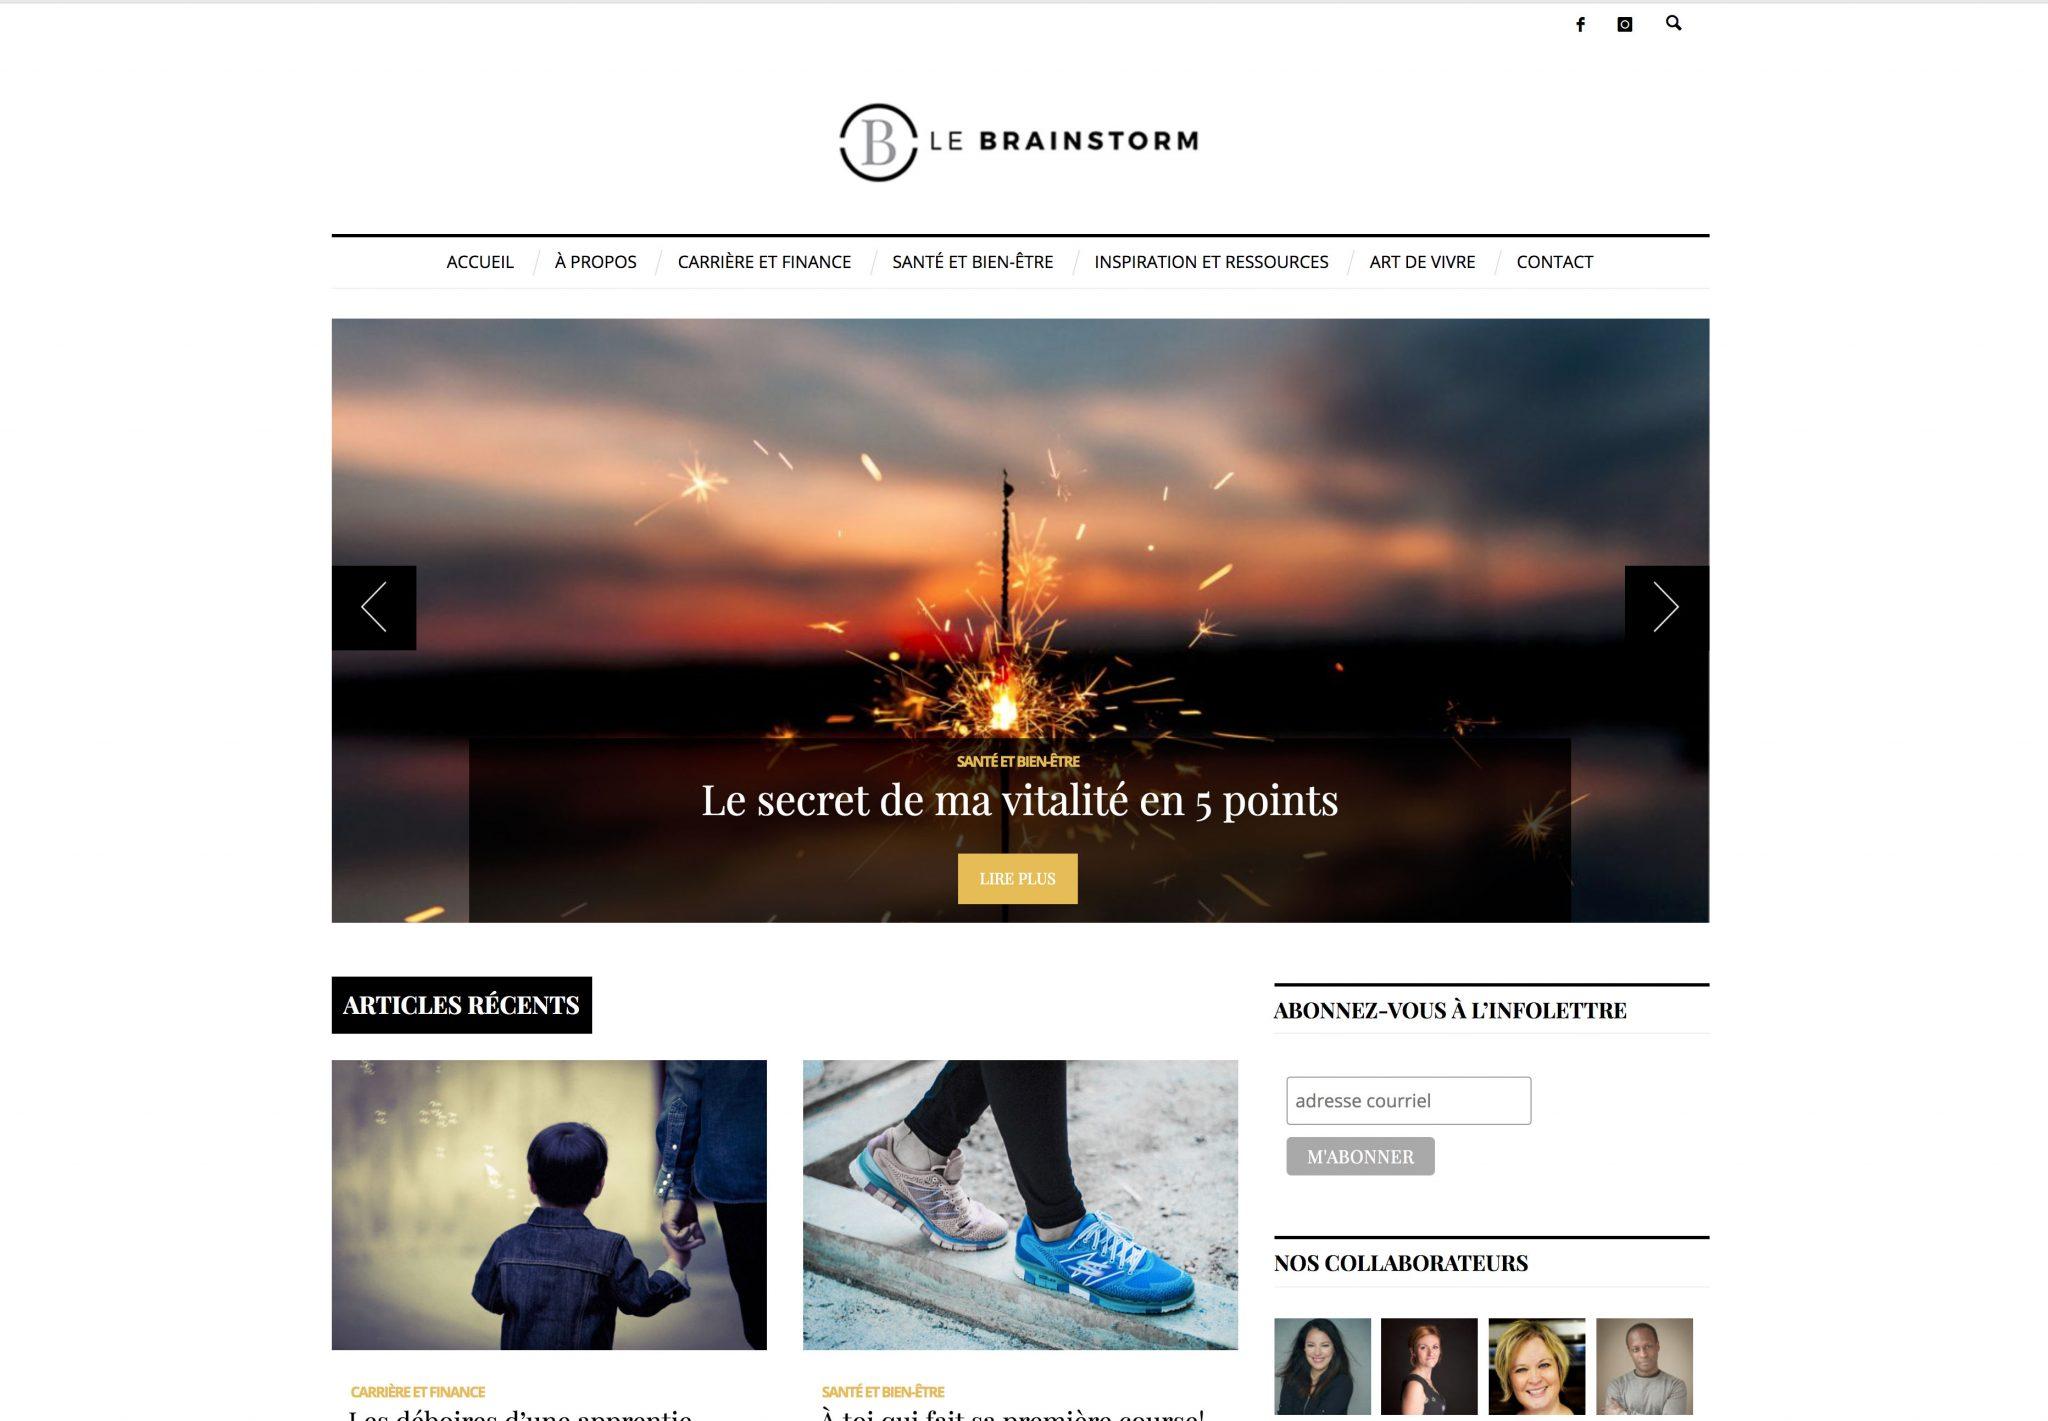 brainstorm_0007_Layer 0